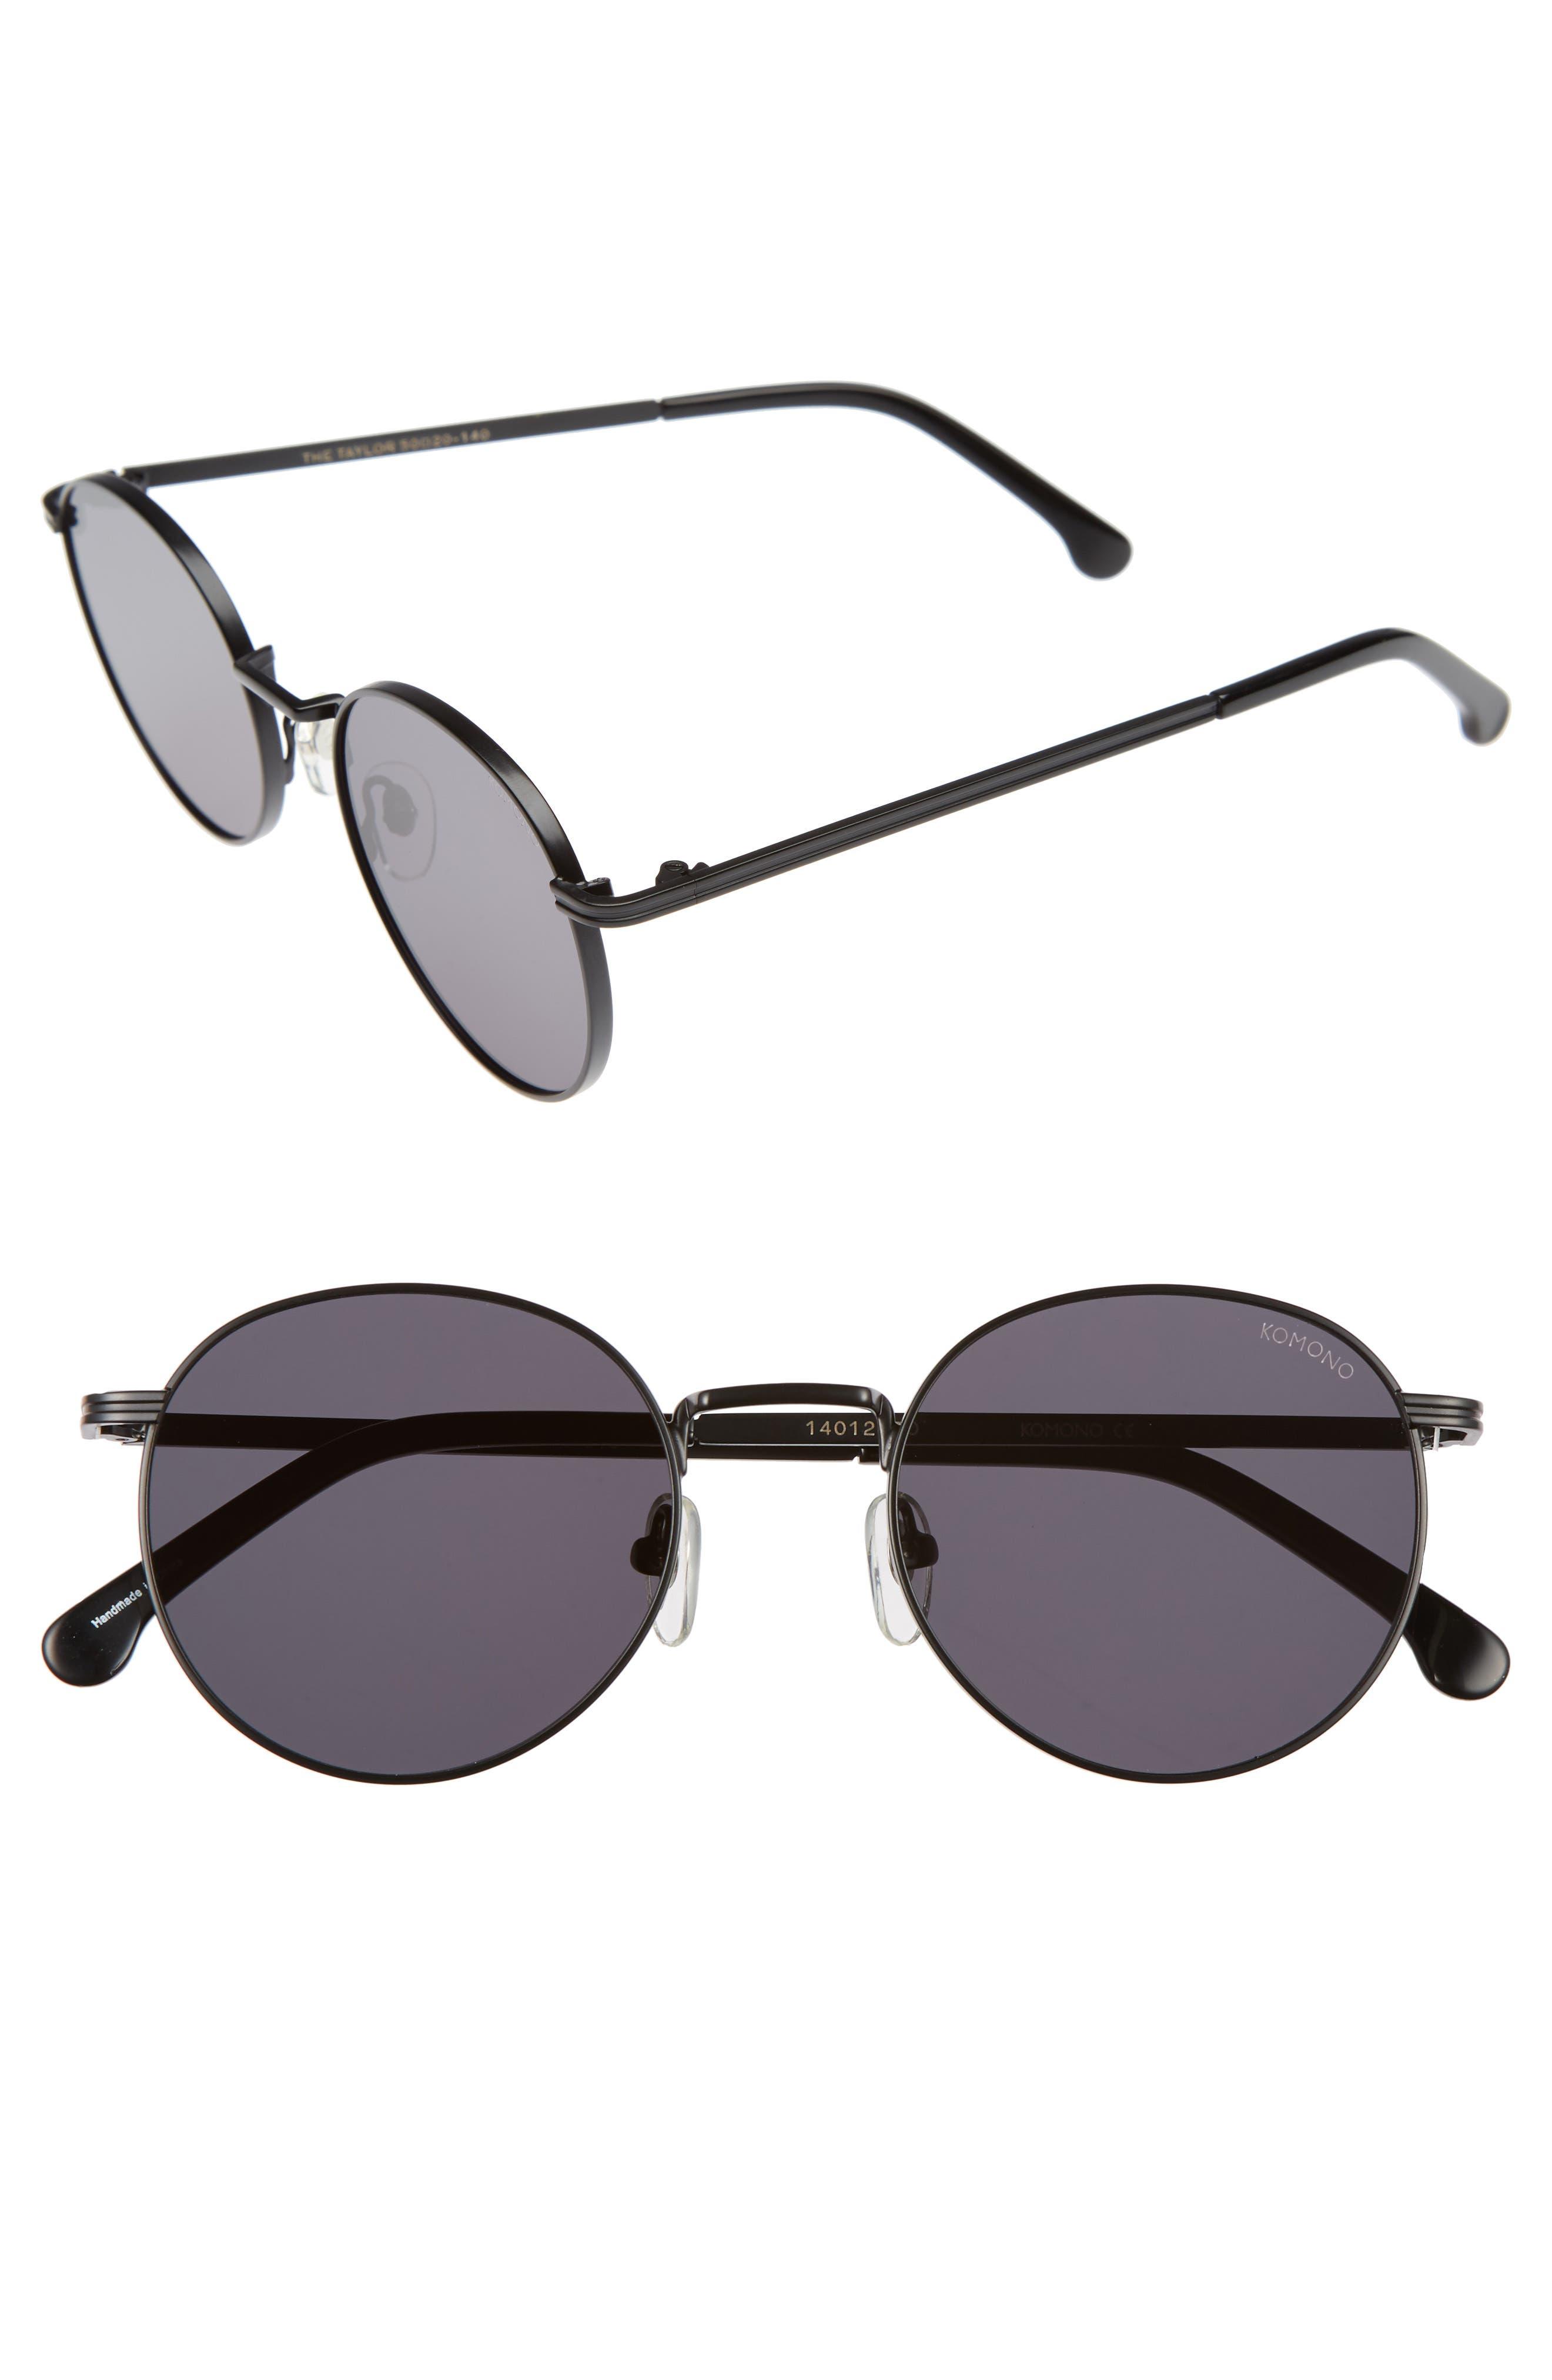 Taylor 50mm Sunglasses,                             Alternate thumbnail 2, color,                             001